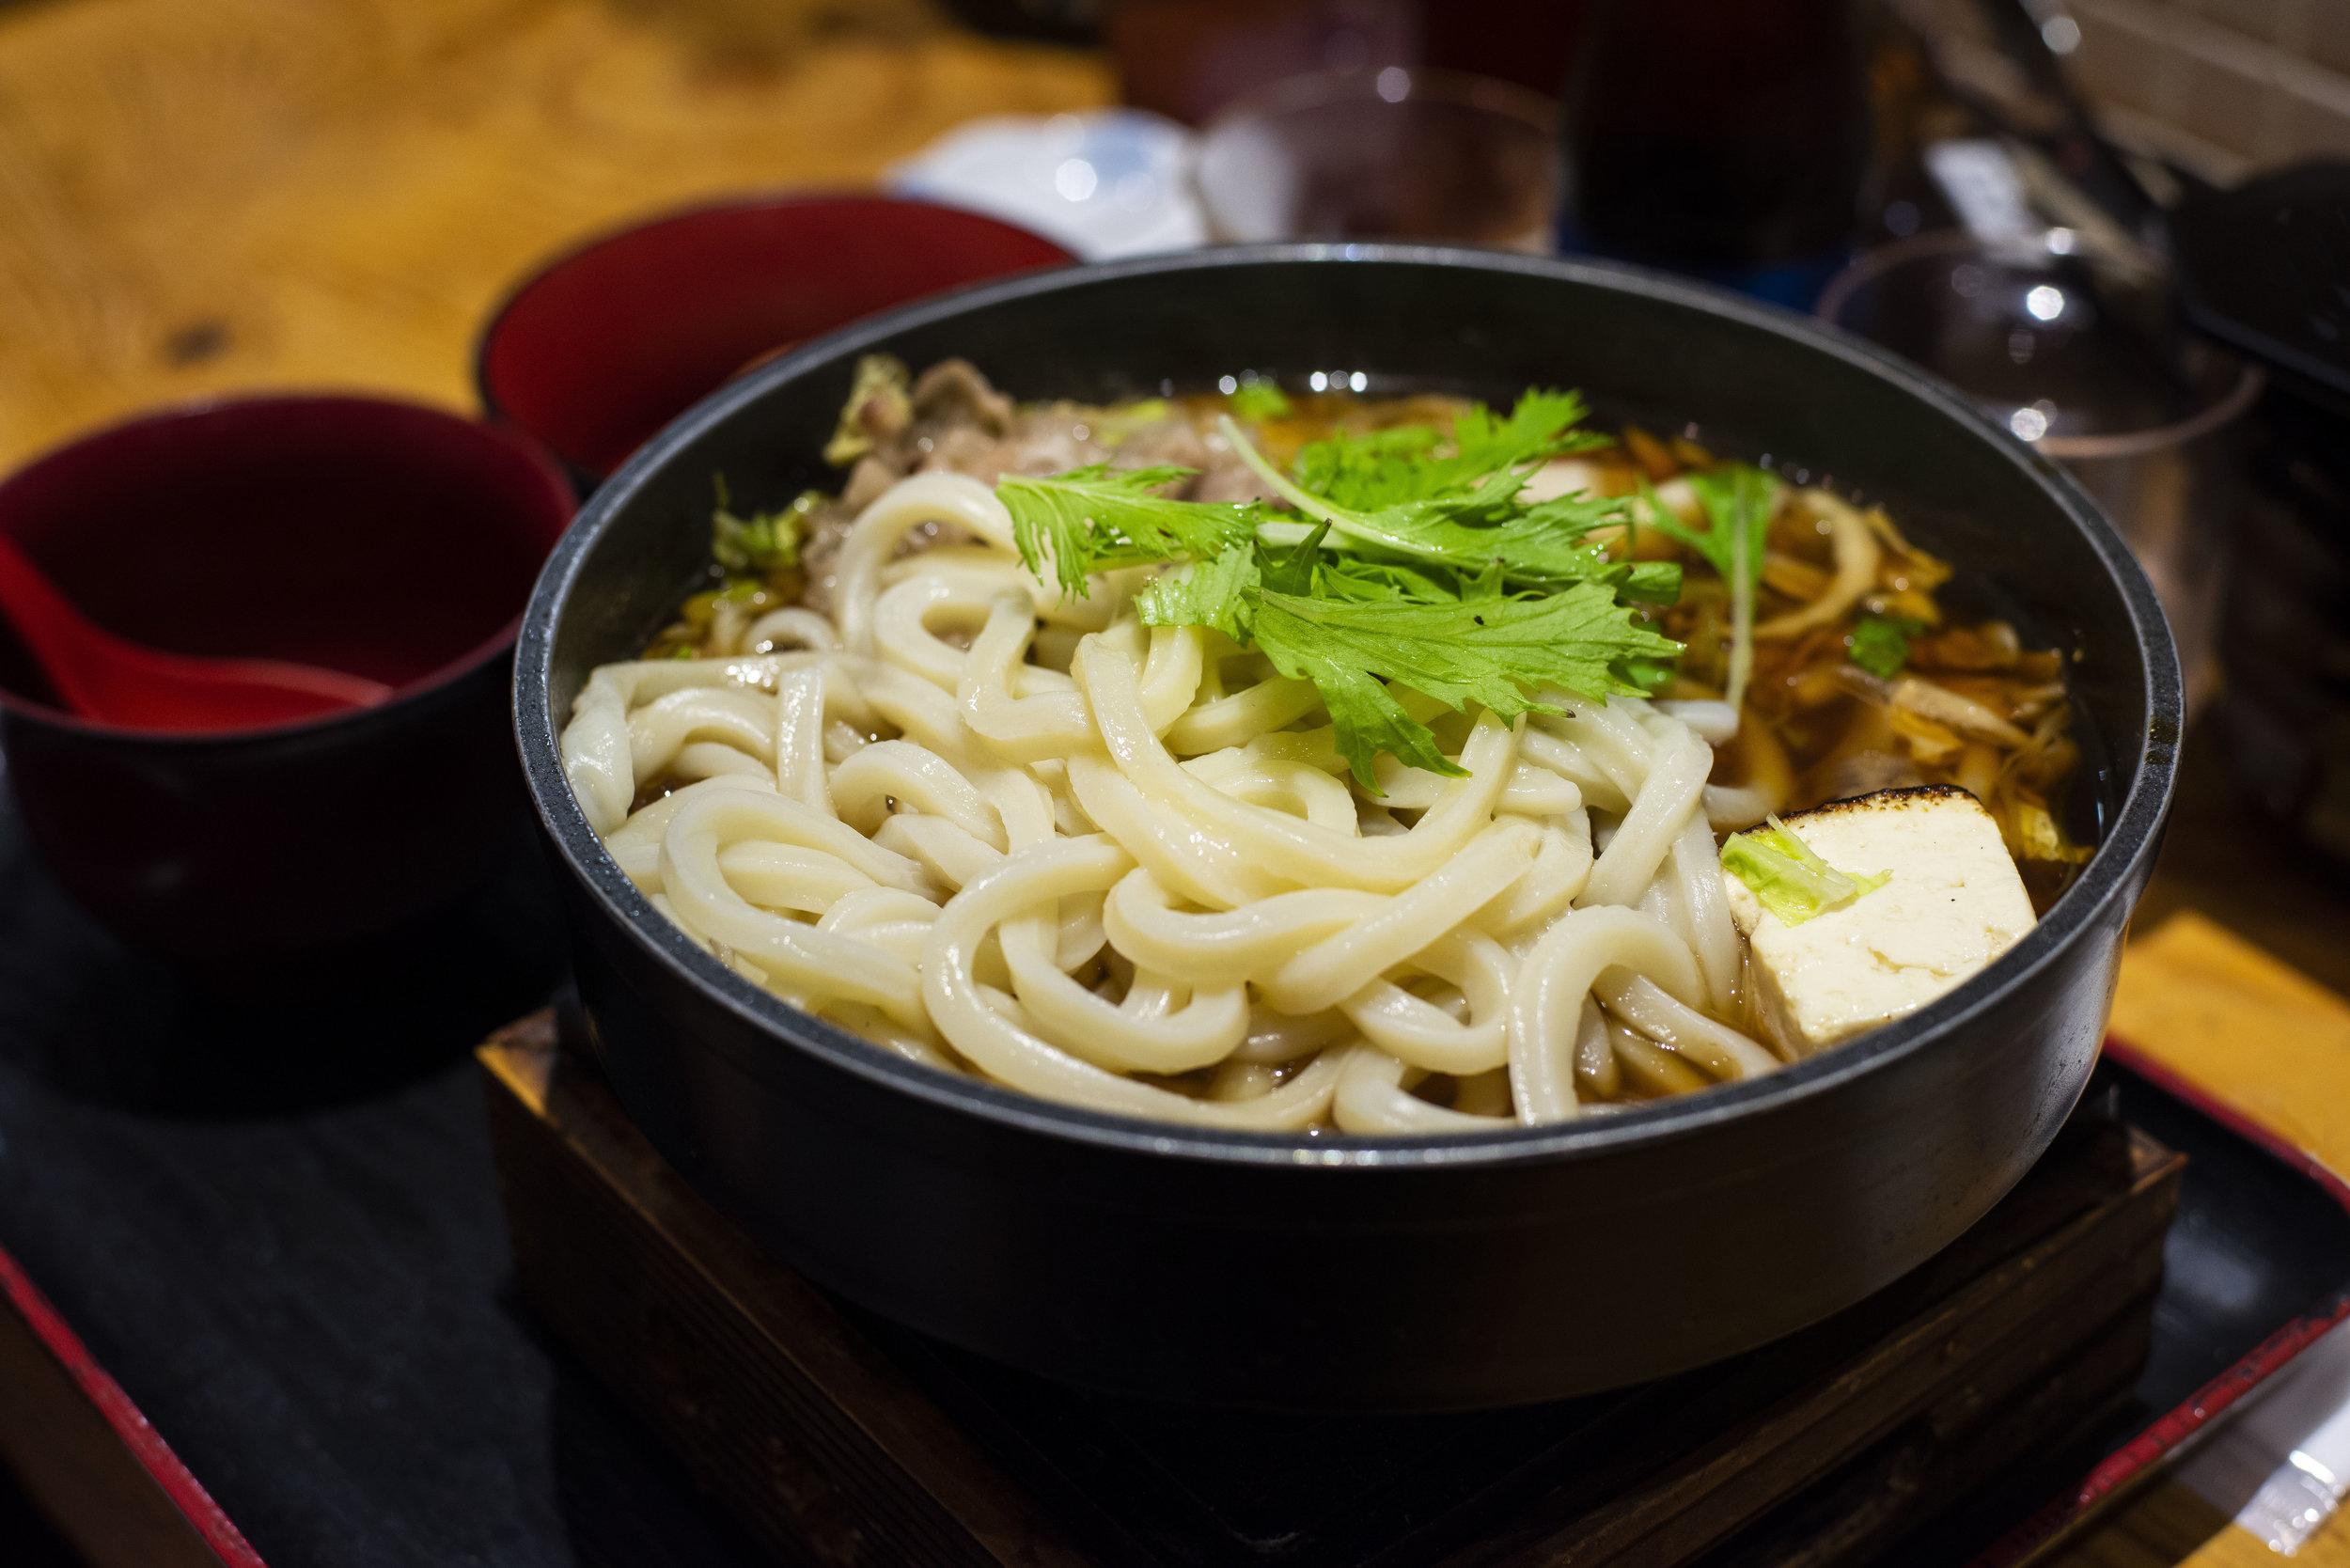 Udon noodles, Japan